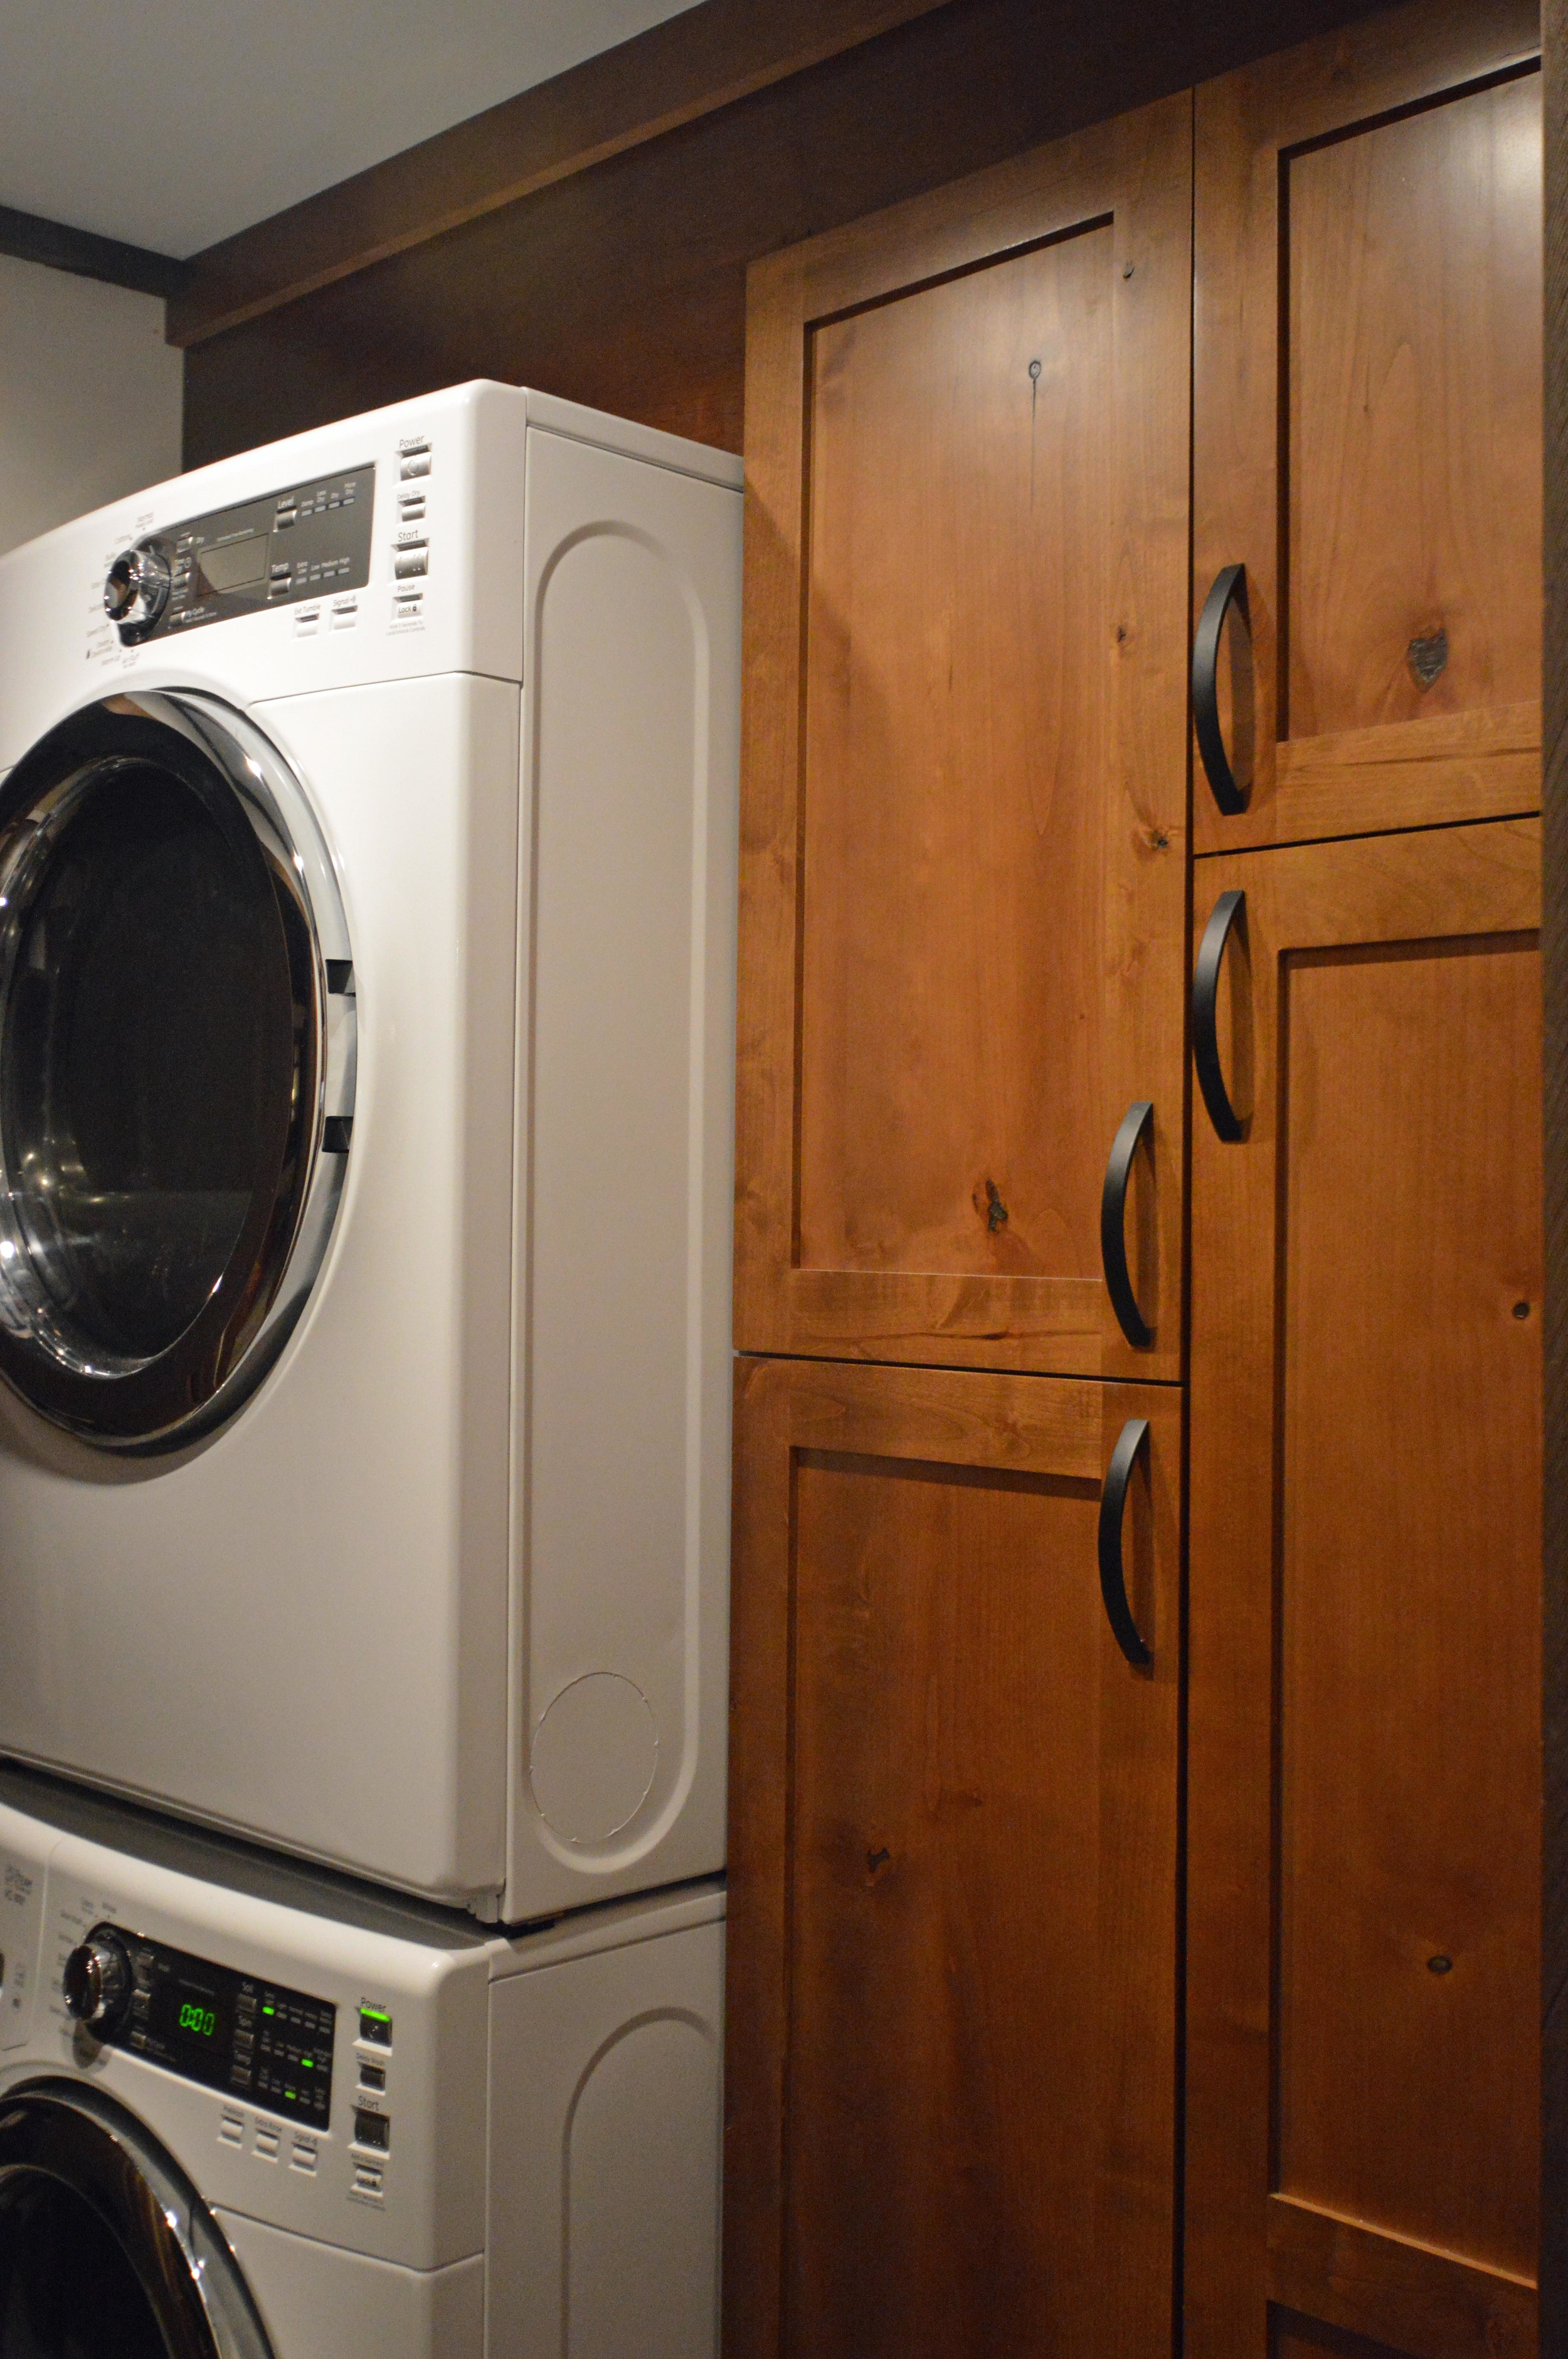 Laundry room remodel in Bolton Landing, NY